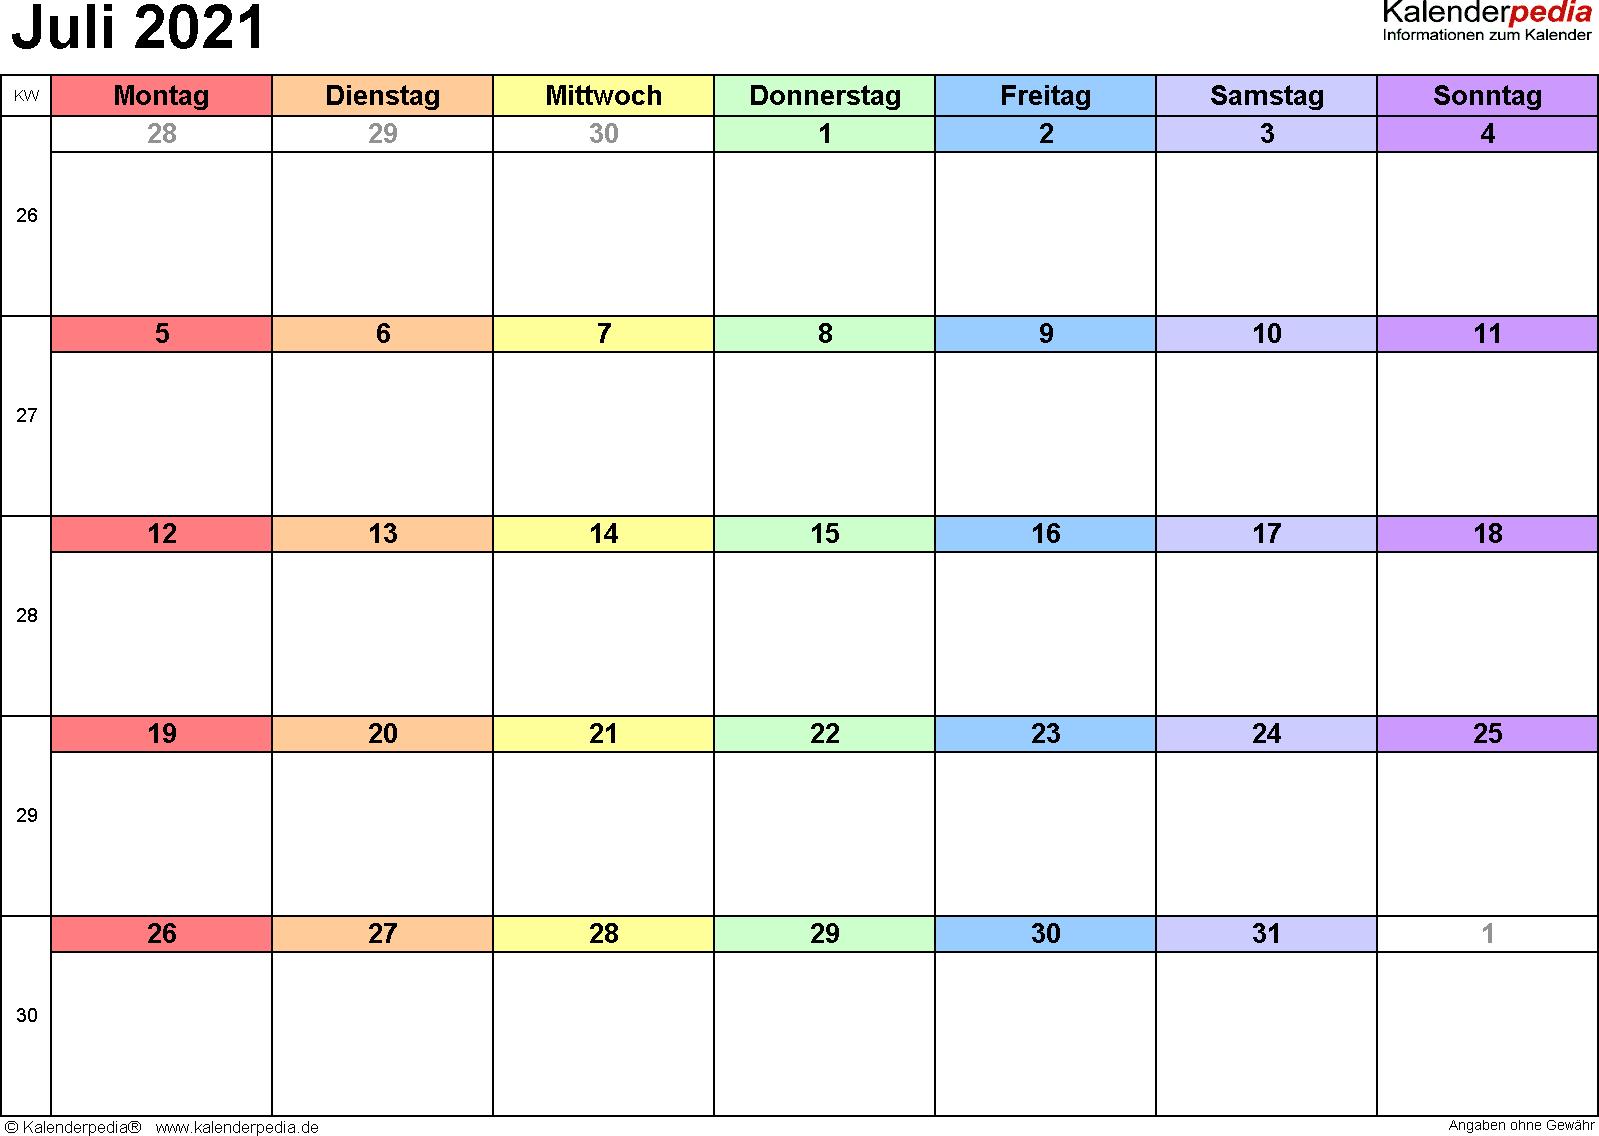 Kalender Juli 2021 (Querformat) als Excel-Vorlage